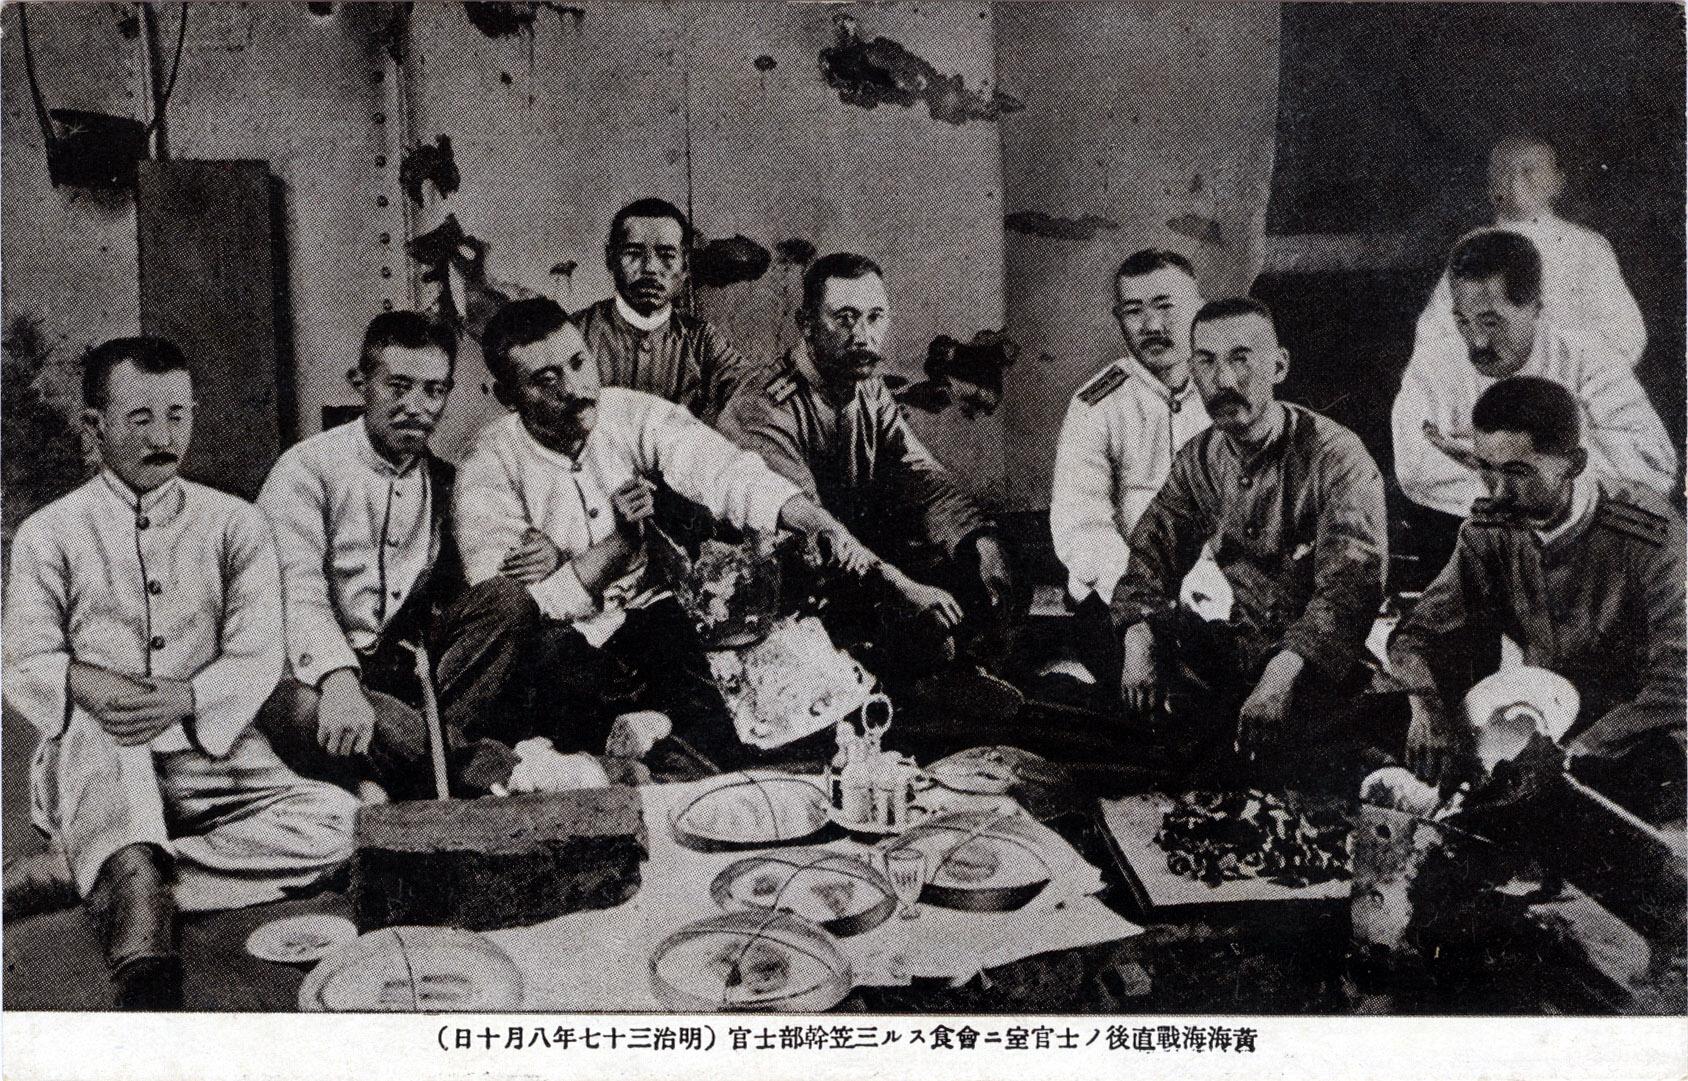 Prajurit Jepang sedang menikmati Kari Jepang